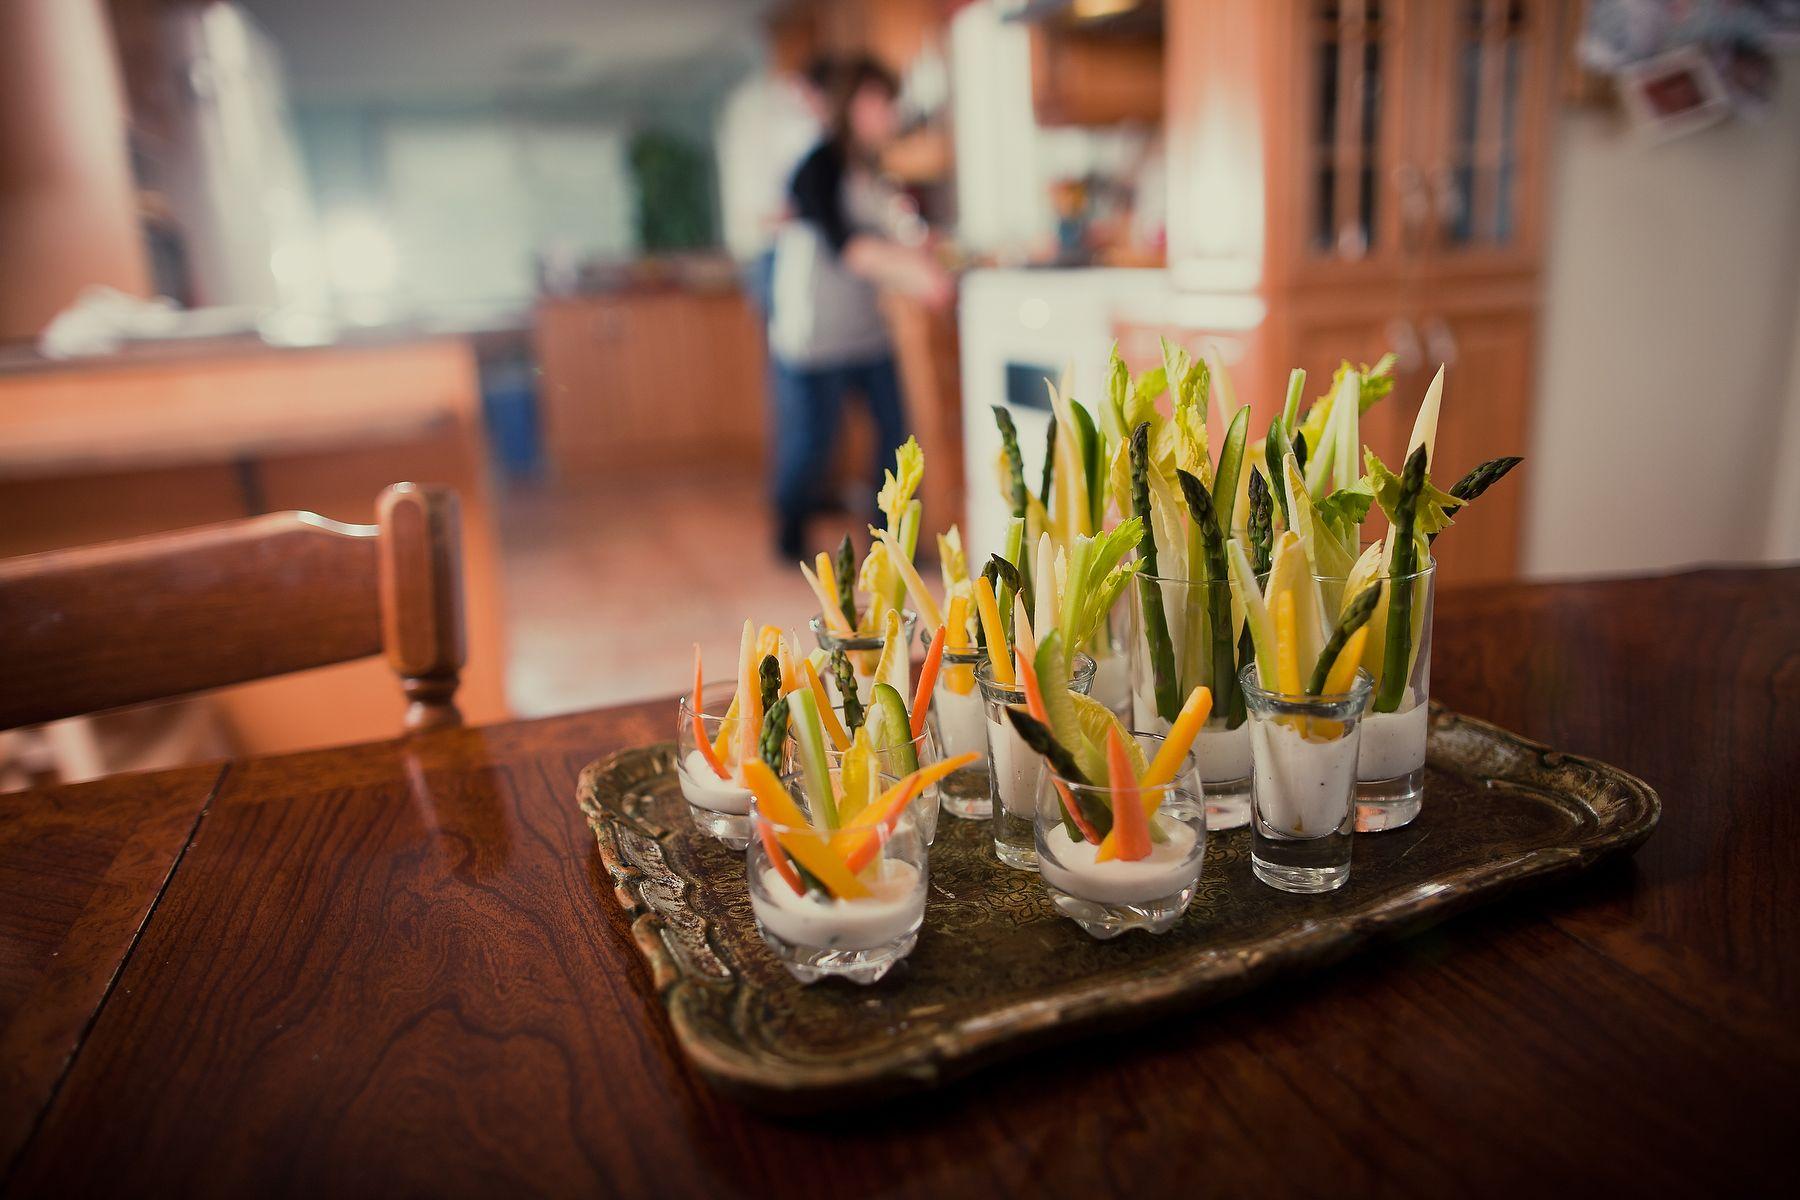 Spring Crudité & Buttermilk Pepper Dip Finger Food for a Baby